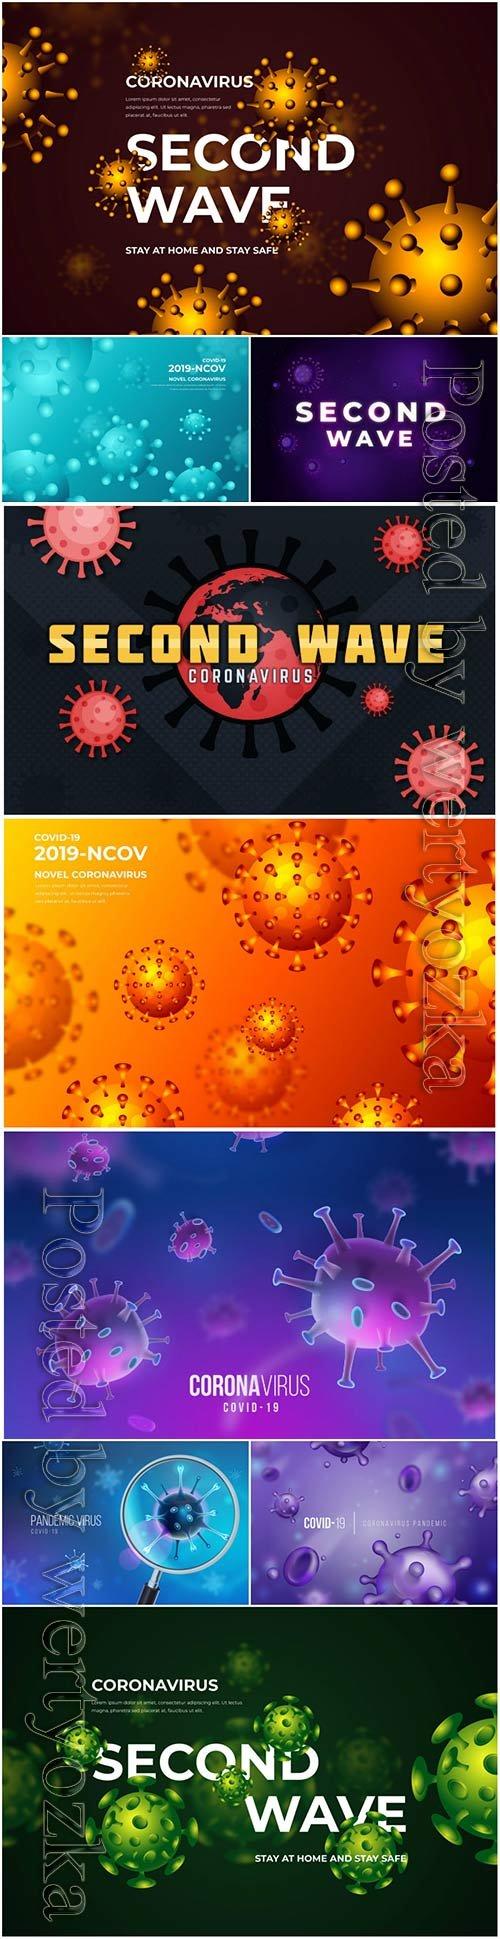 Realistic coronavirus vector background, stop covid-19 vol 7